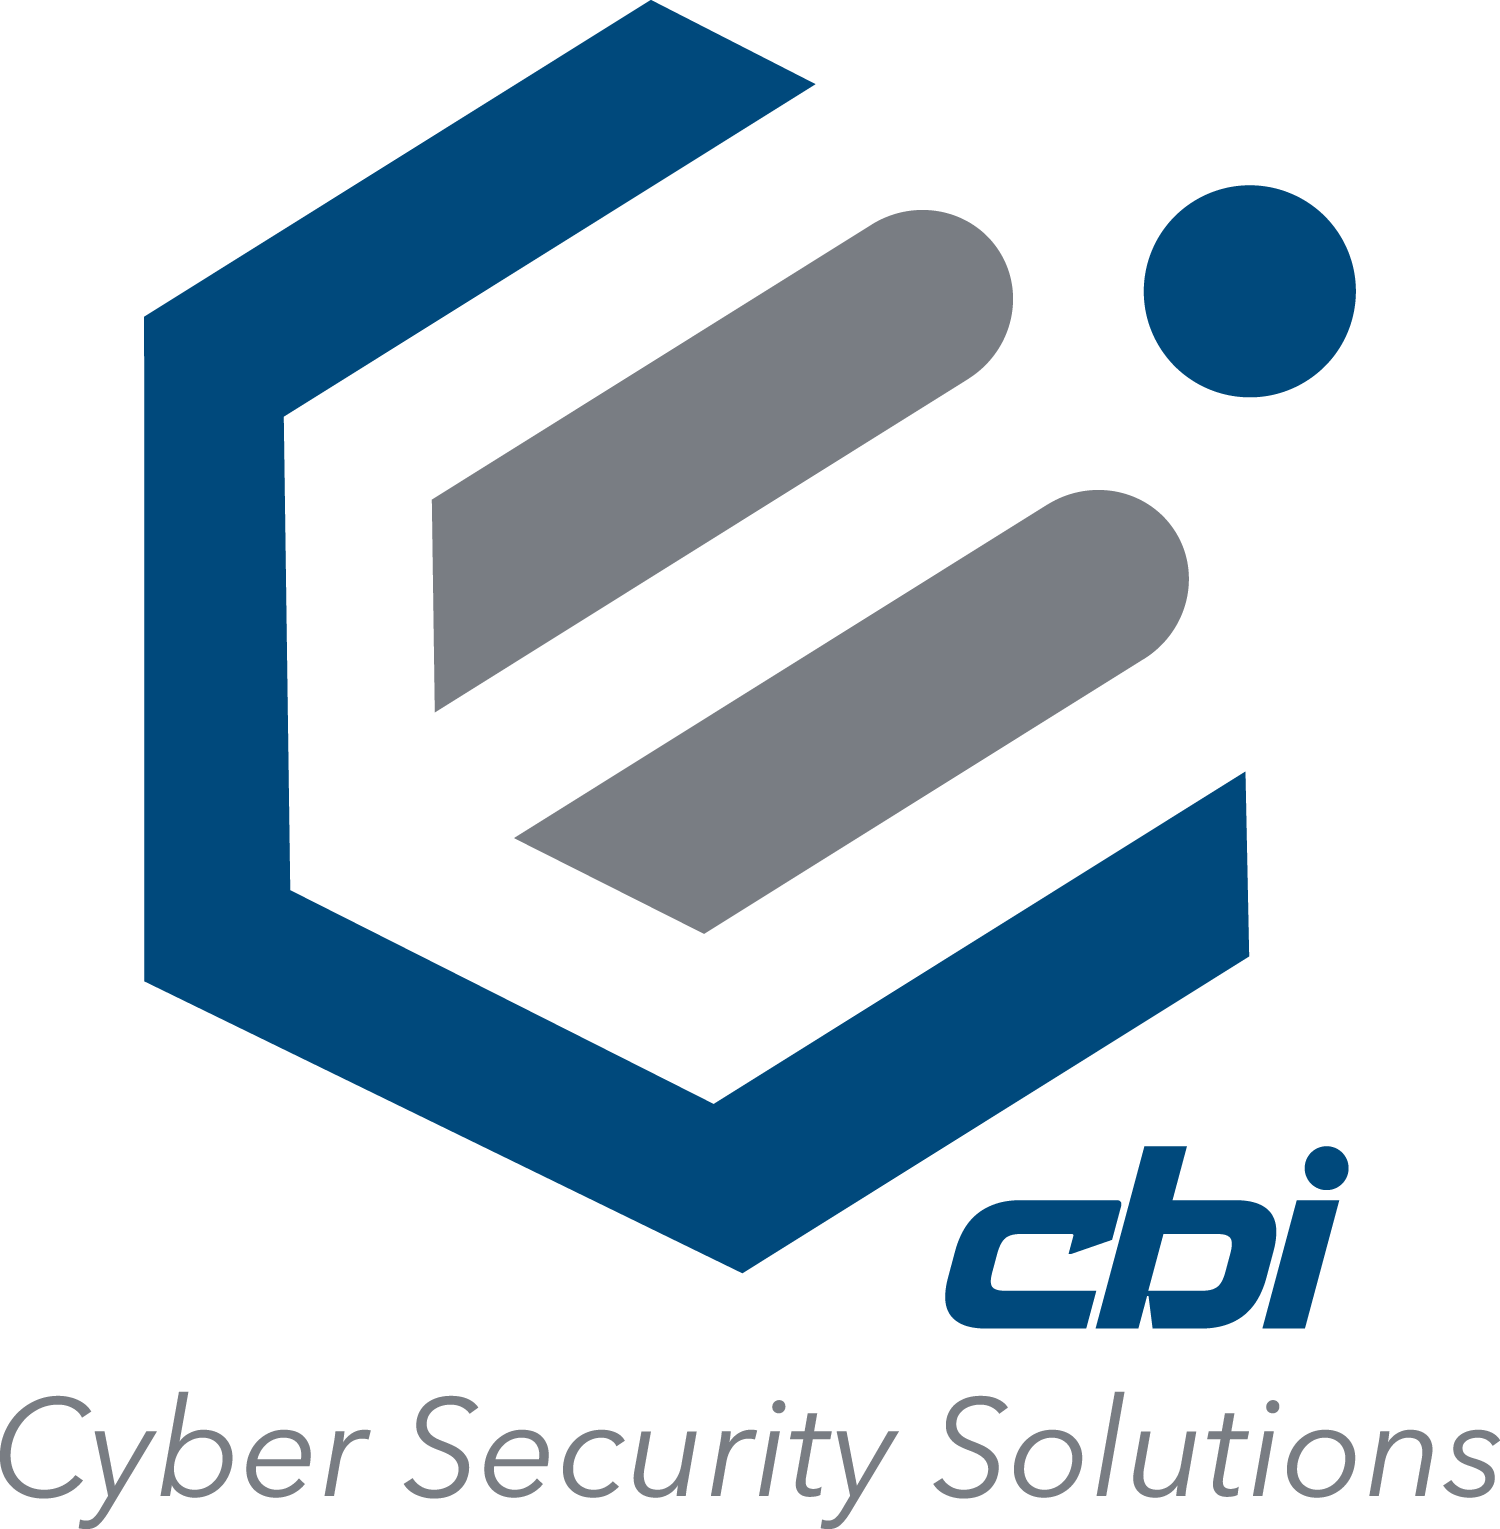 CBI Cybersecurity Solutions logo